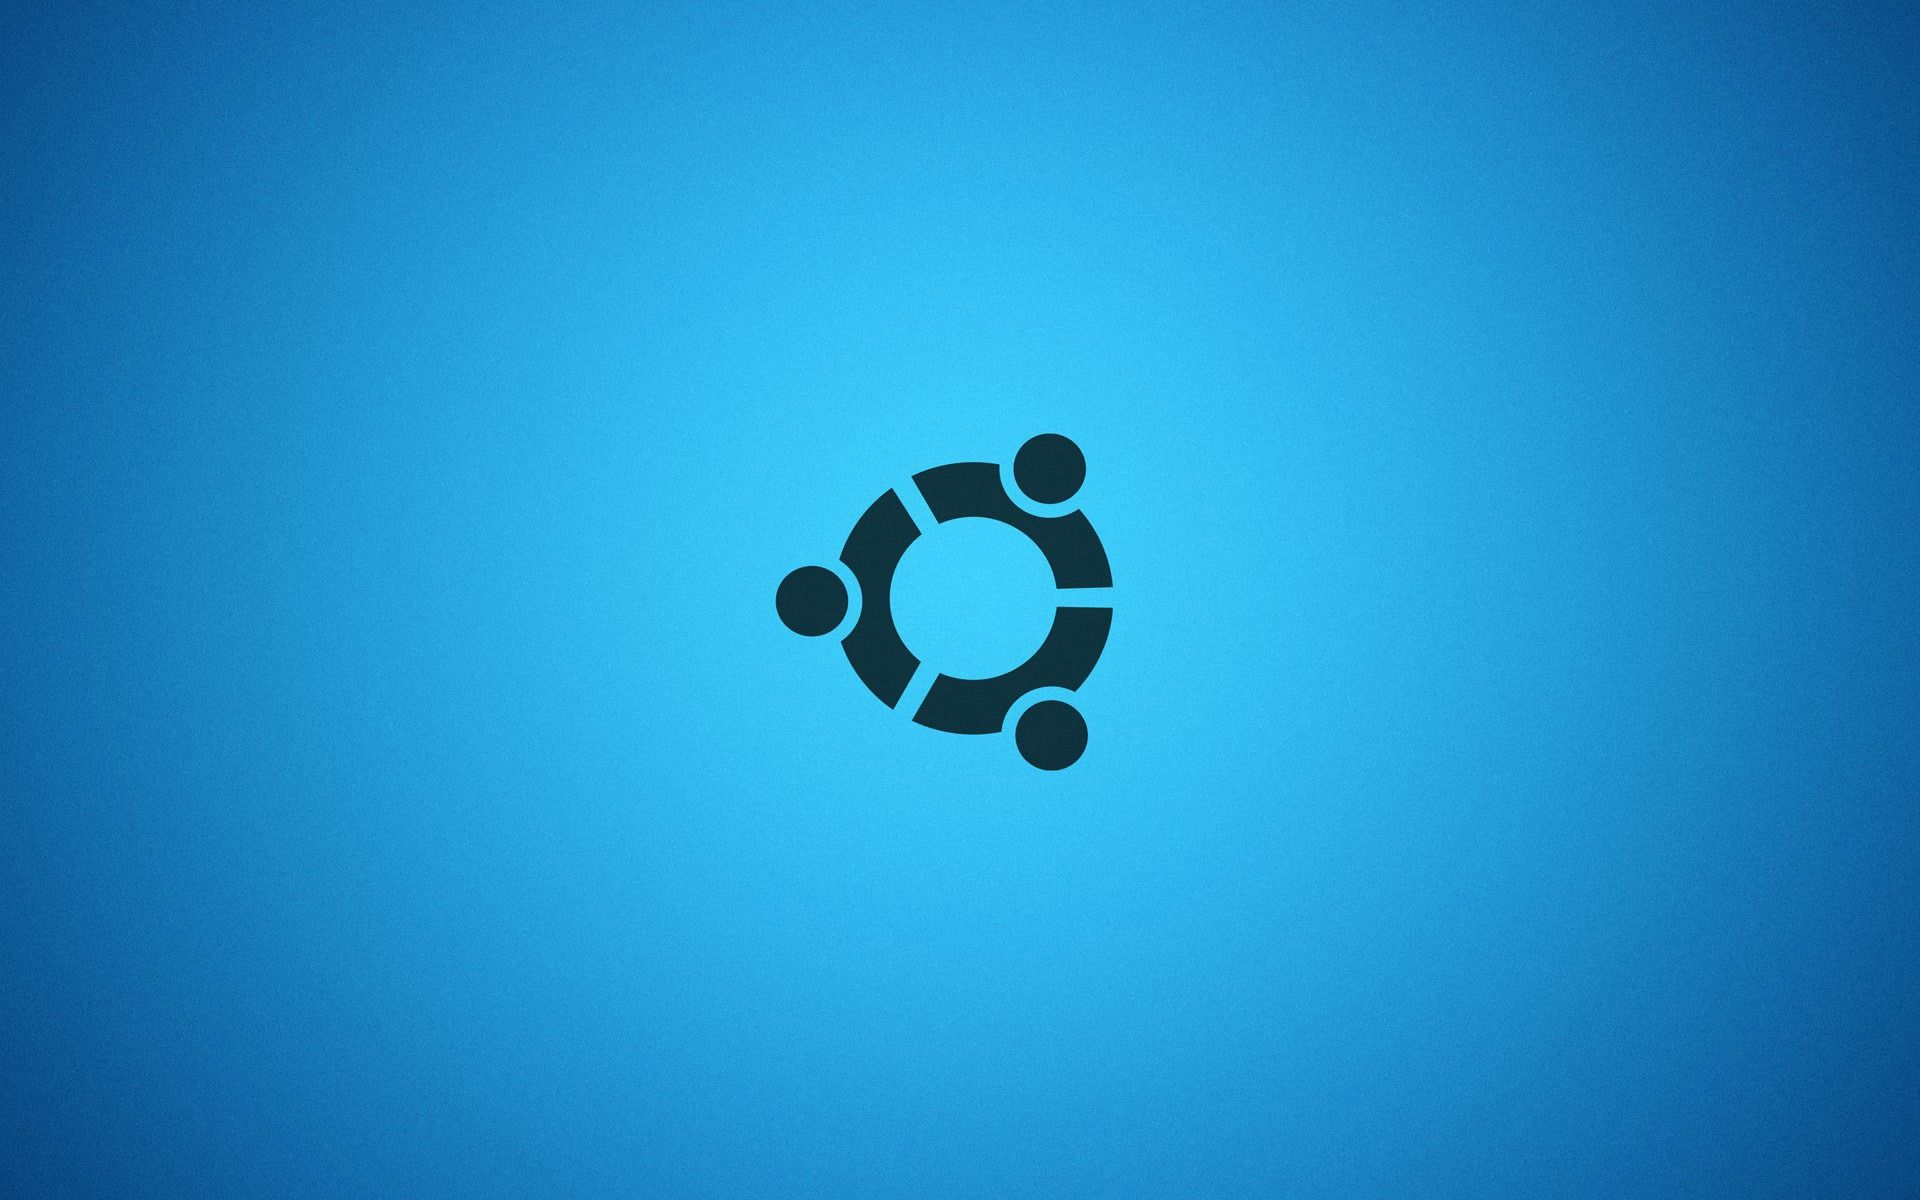 ubuntu blue linux system desktop background wallpaper   1920x1200 1920x1200